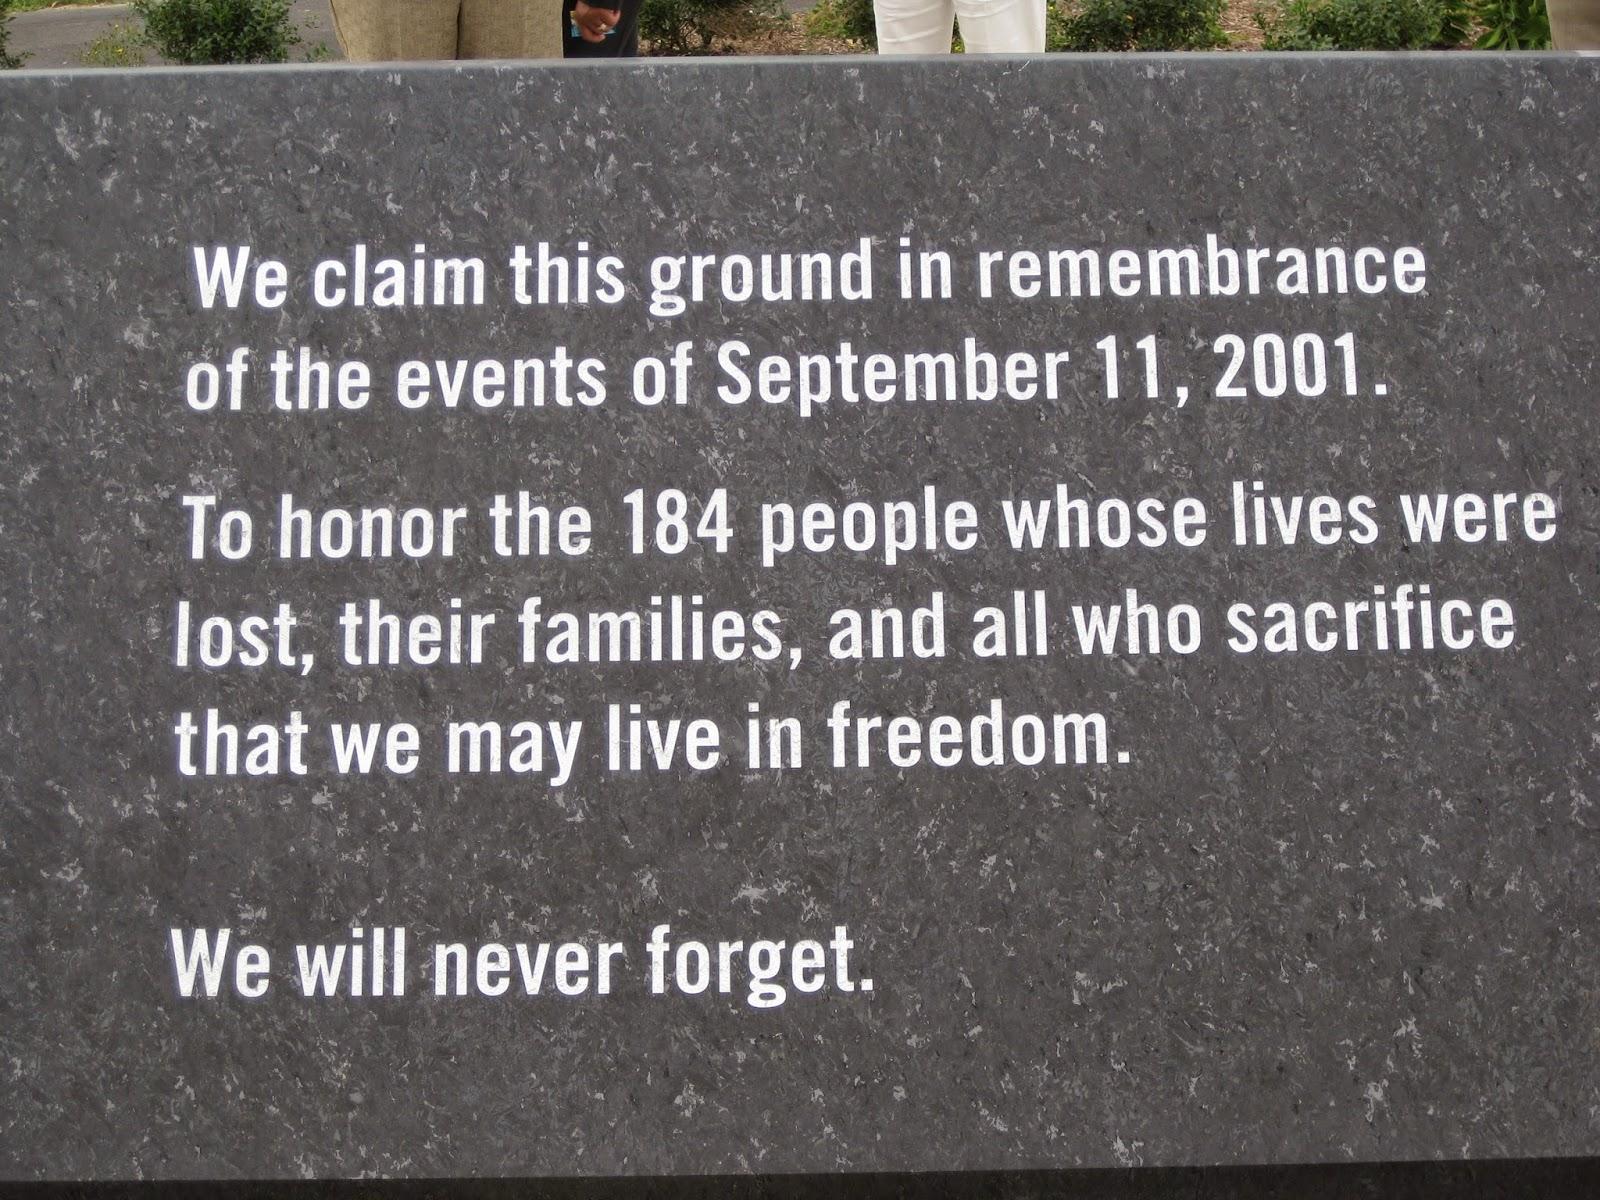 9-11 pentagon memorial stone image